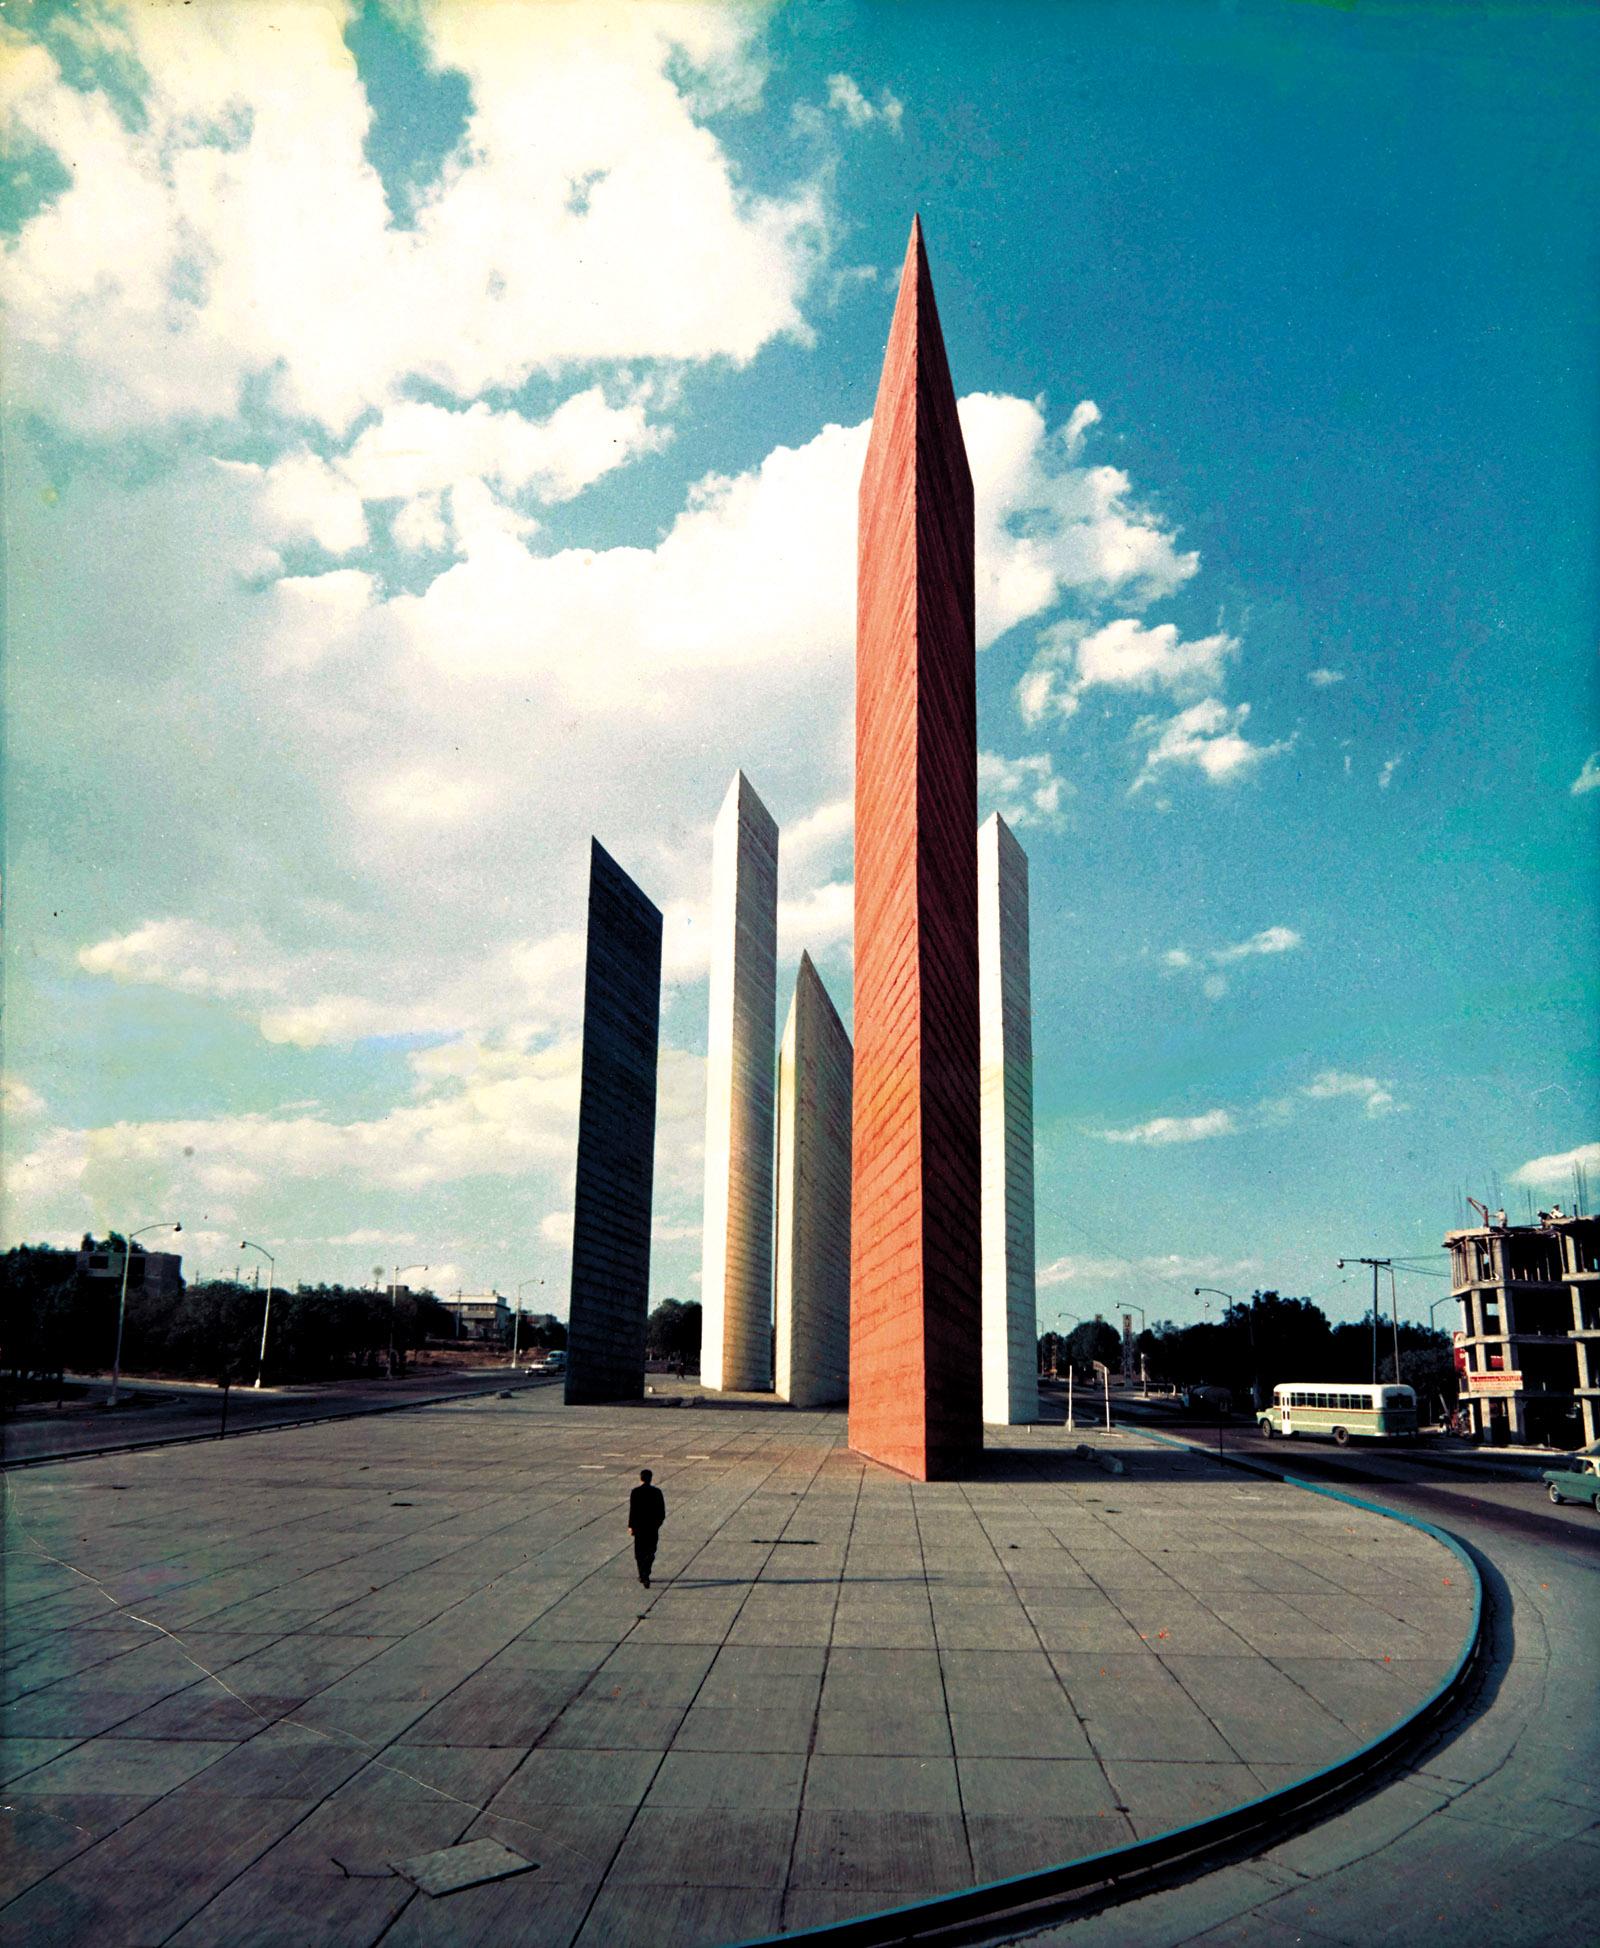 The Tower of Satellite City, designed by Mathias Goertiz and Luis Barragán, Naucalpan de Juárez, Mexico, 1957; photograph by Hans Namuth, circa 1964